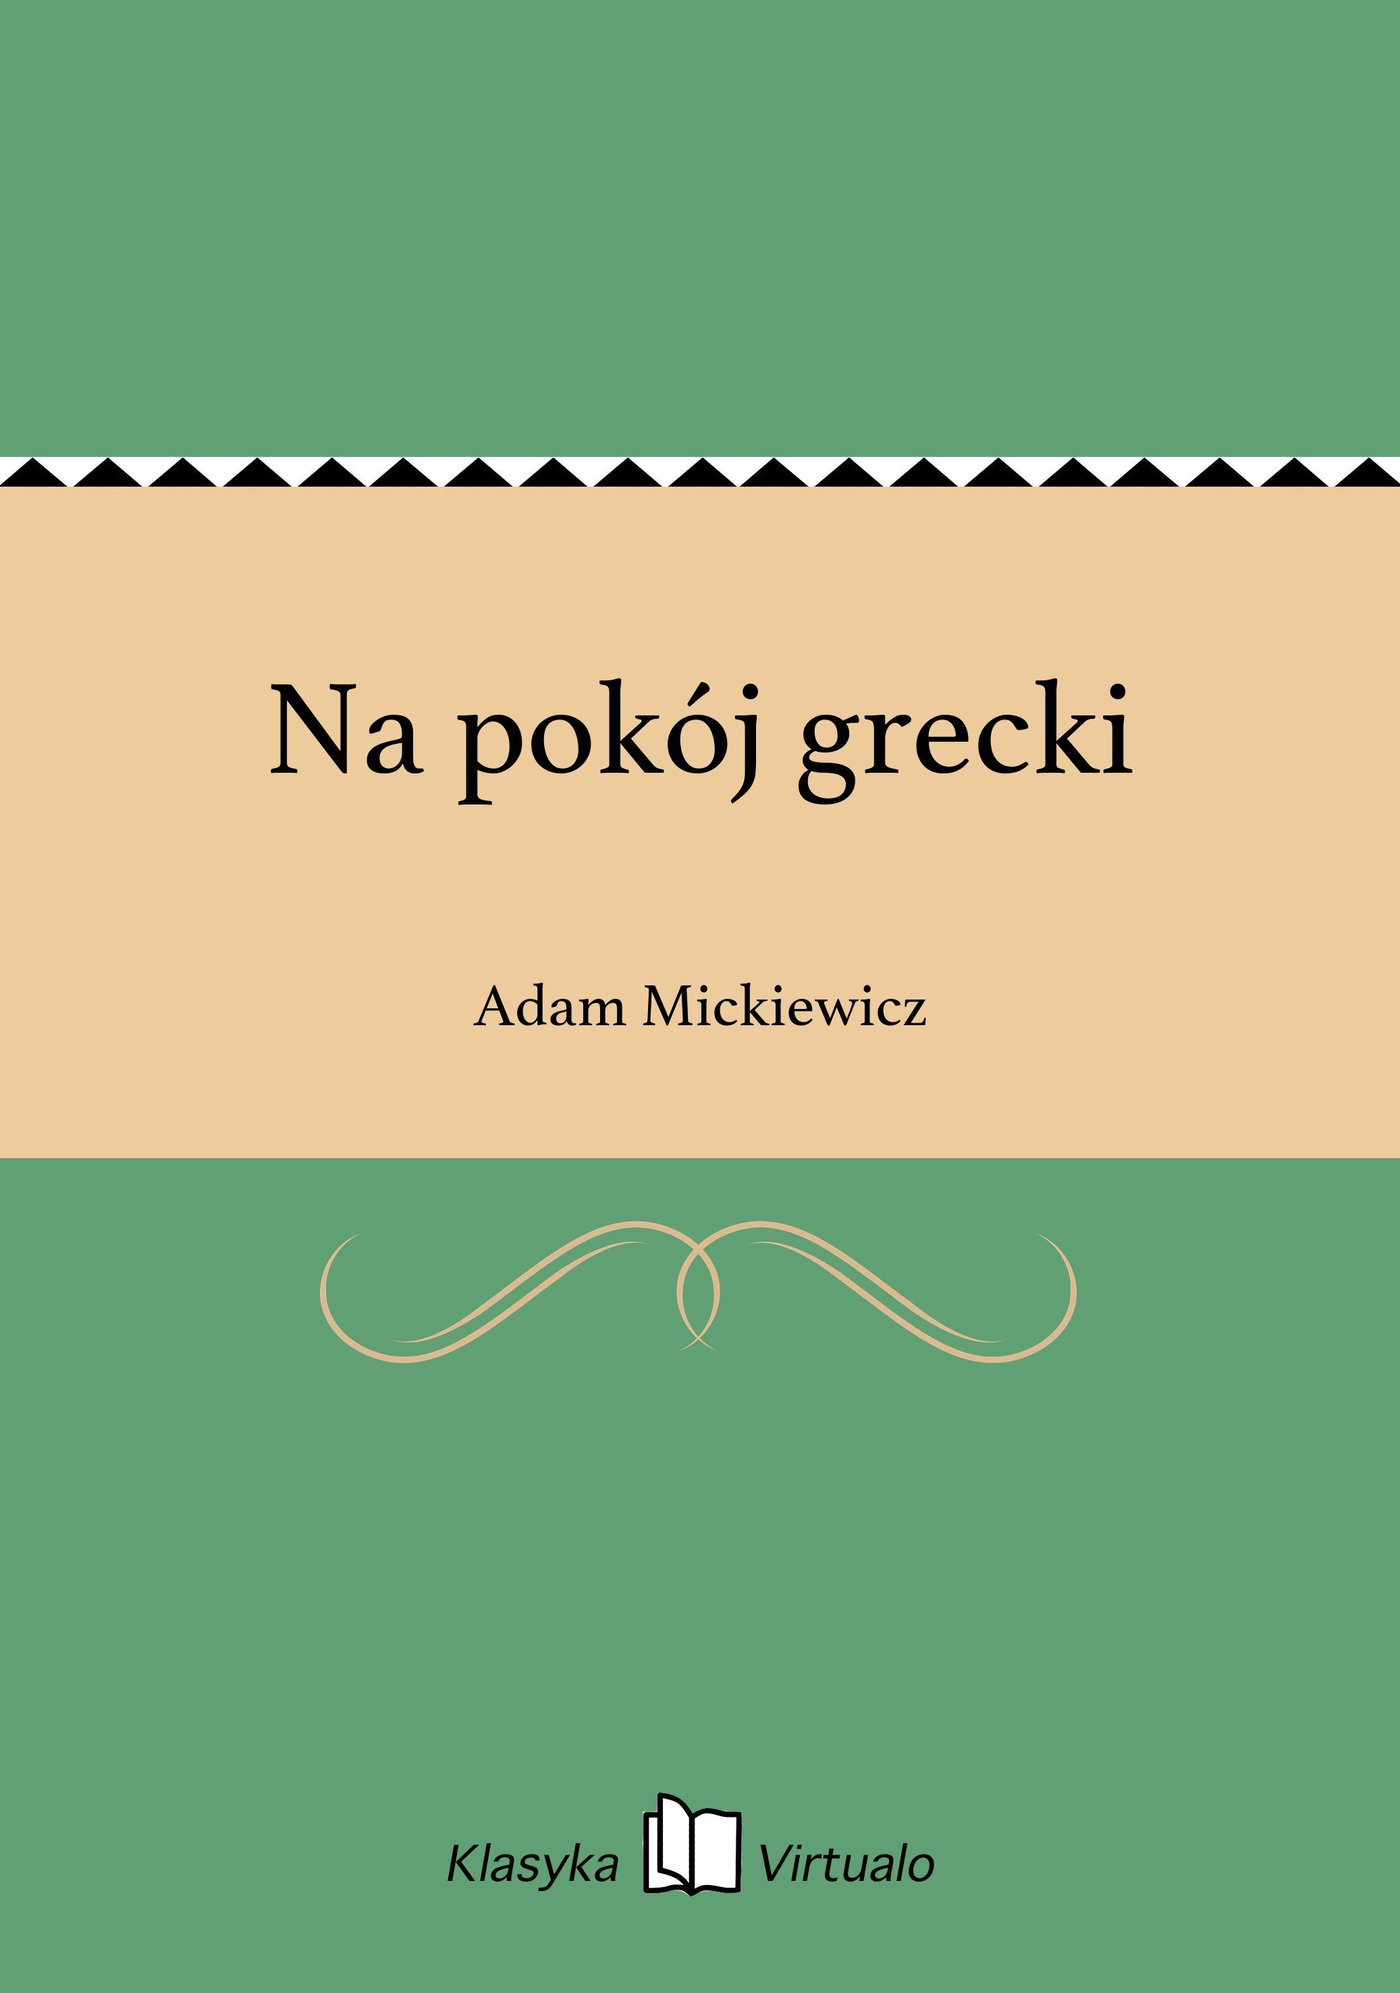 Na pokój grecki - Ebook (Książka EPUB) do pobrania w formacie EPUB